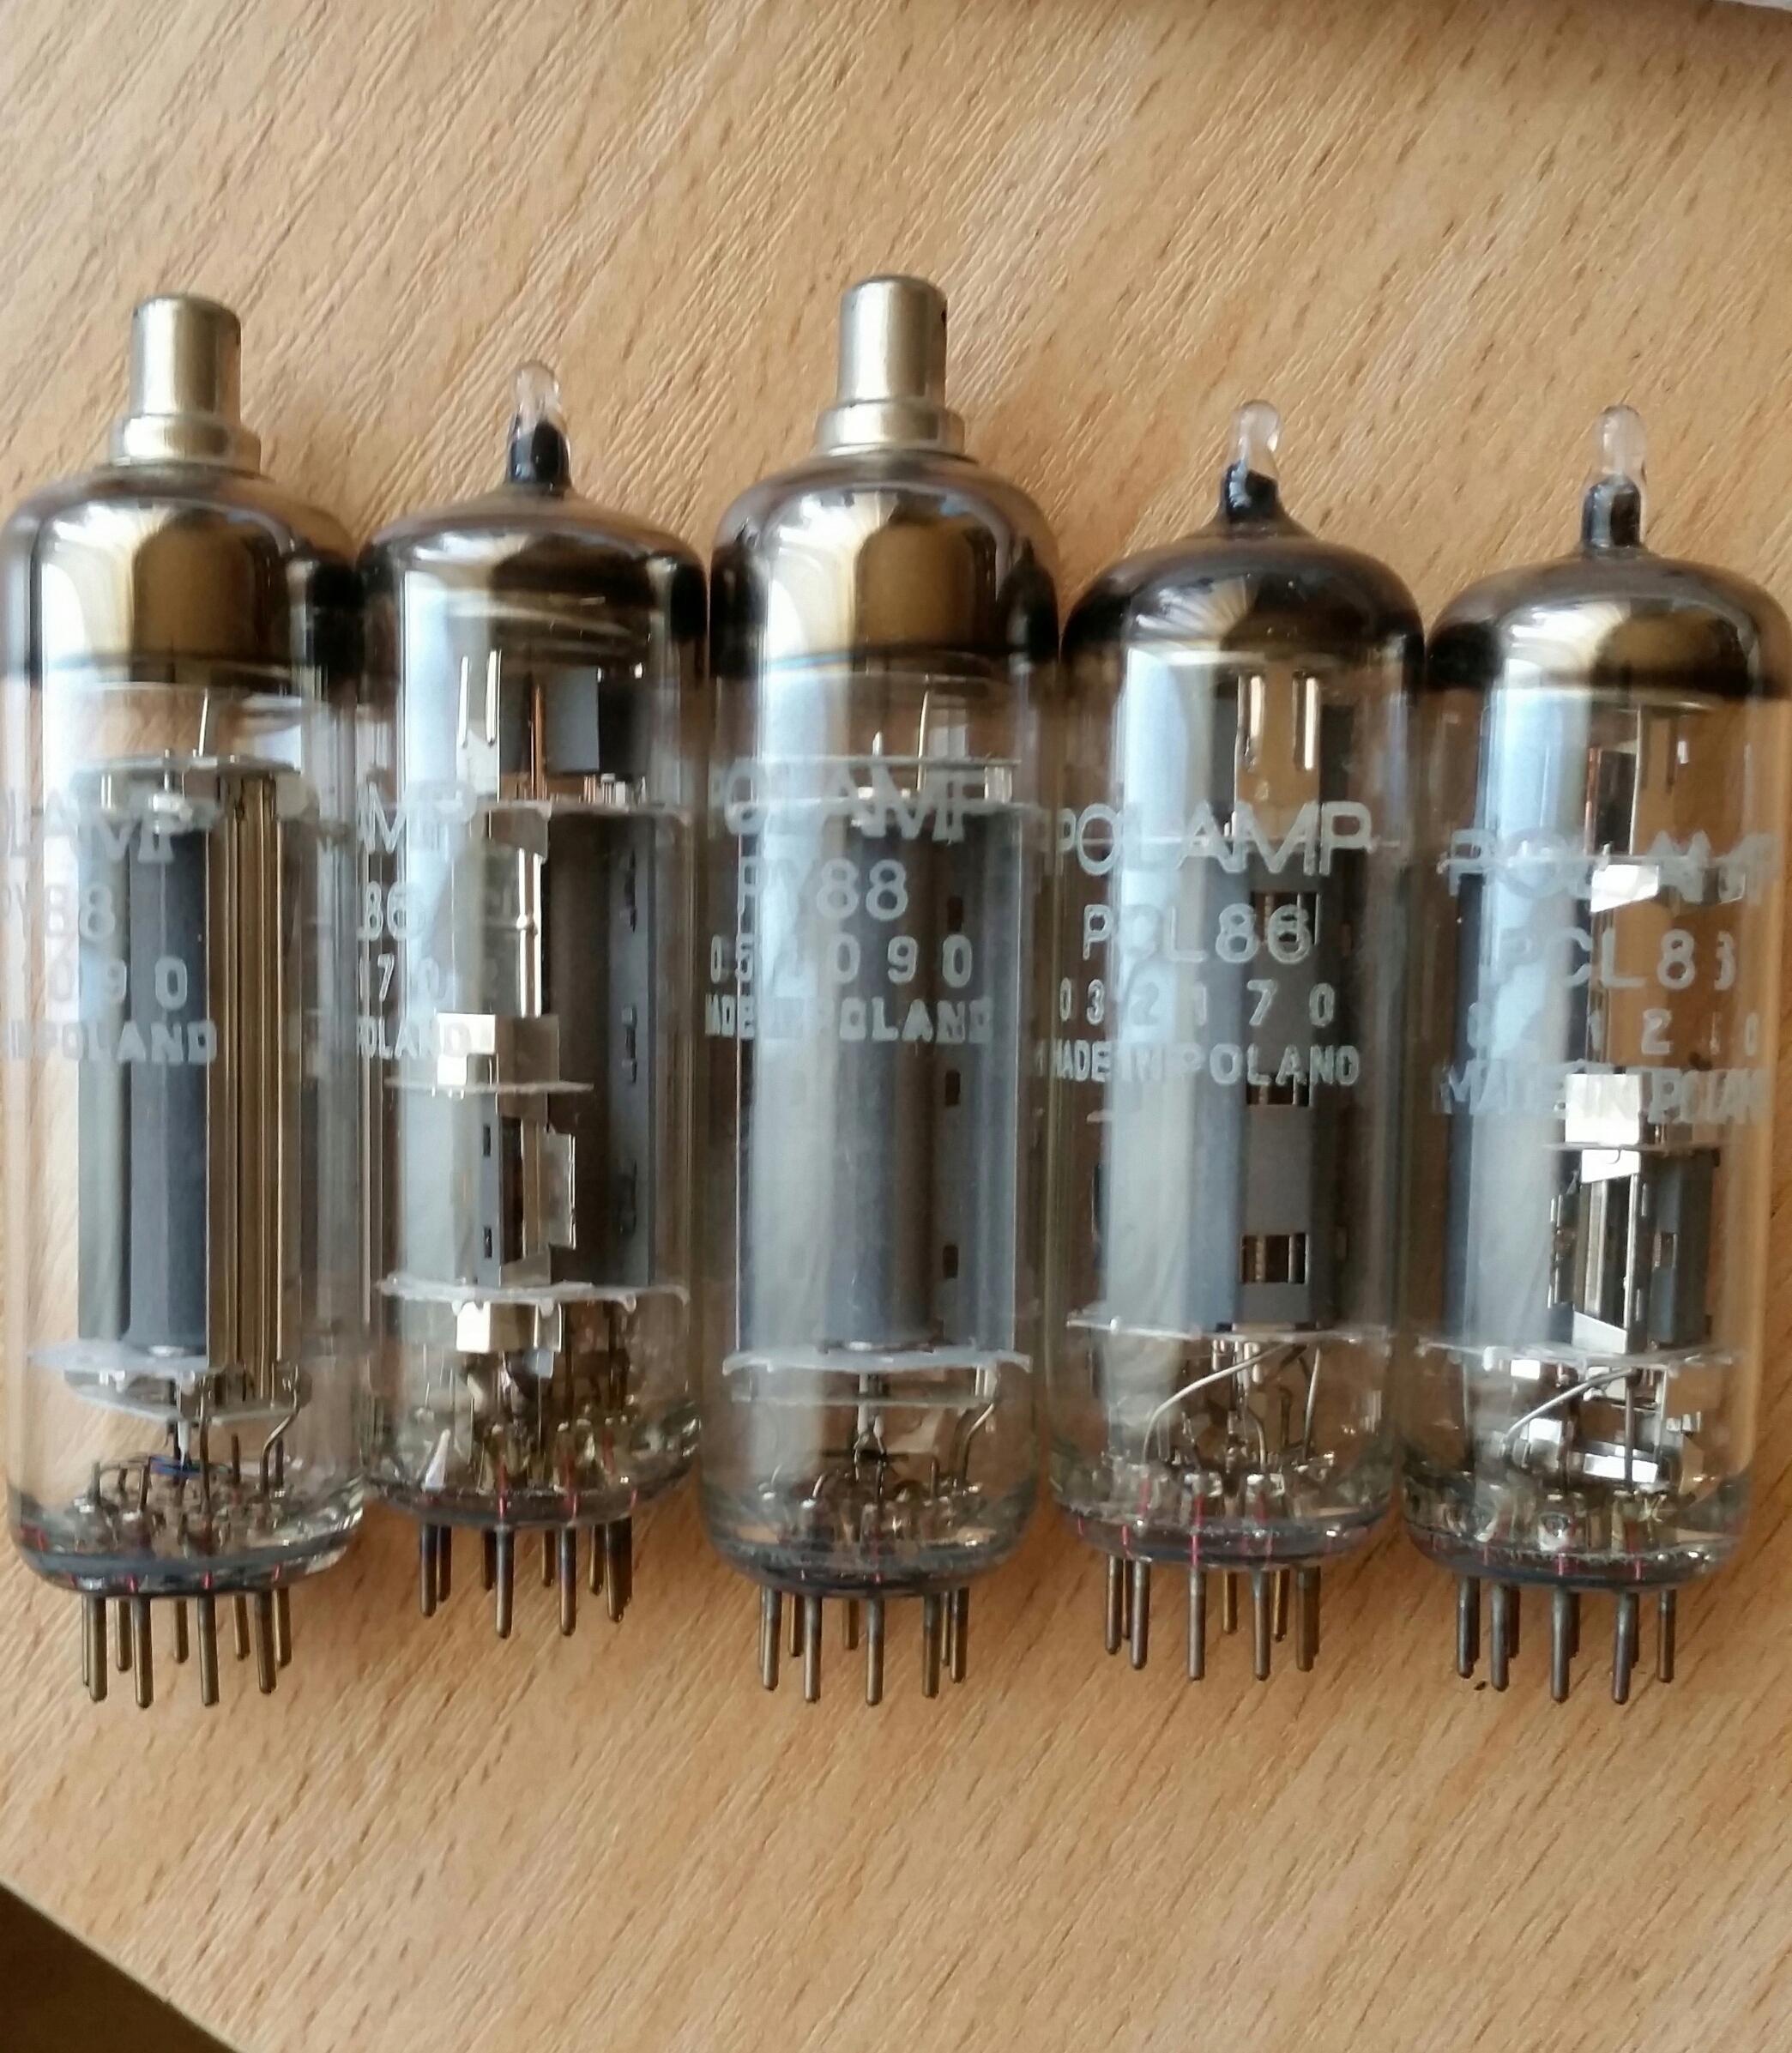 Lampy lampa elektronowa zestaw 50szt.- PY88 PCL86